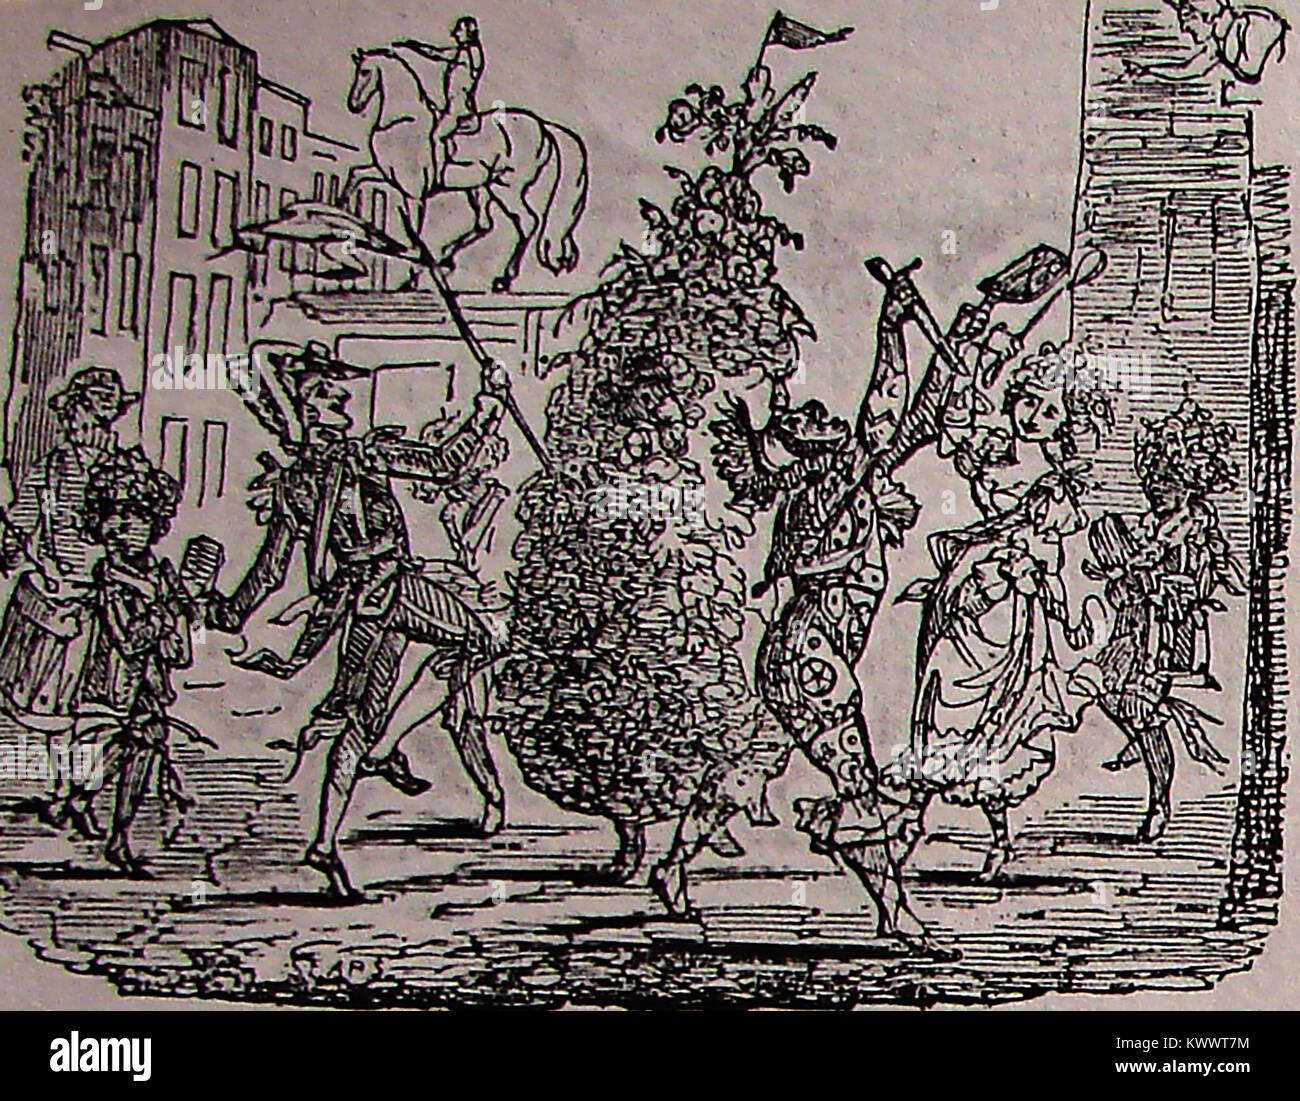 May Day Celebrations - A chimney sweeps parade circa 1790's Stock Photo